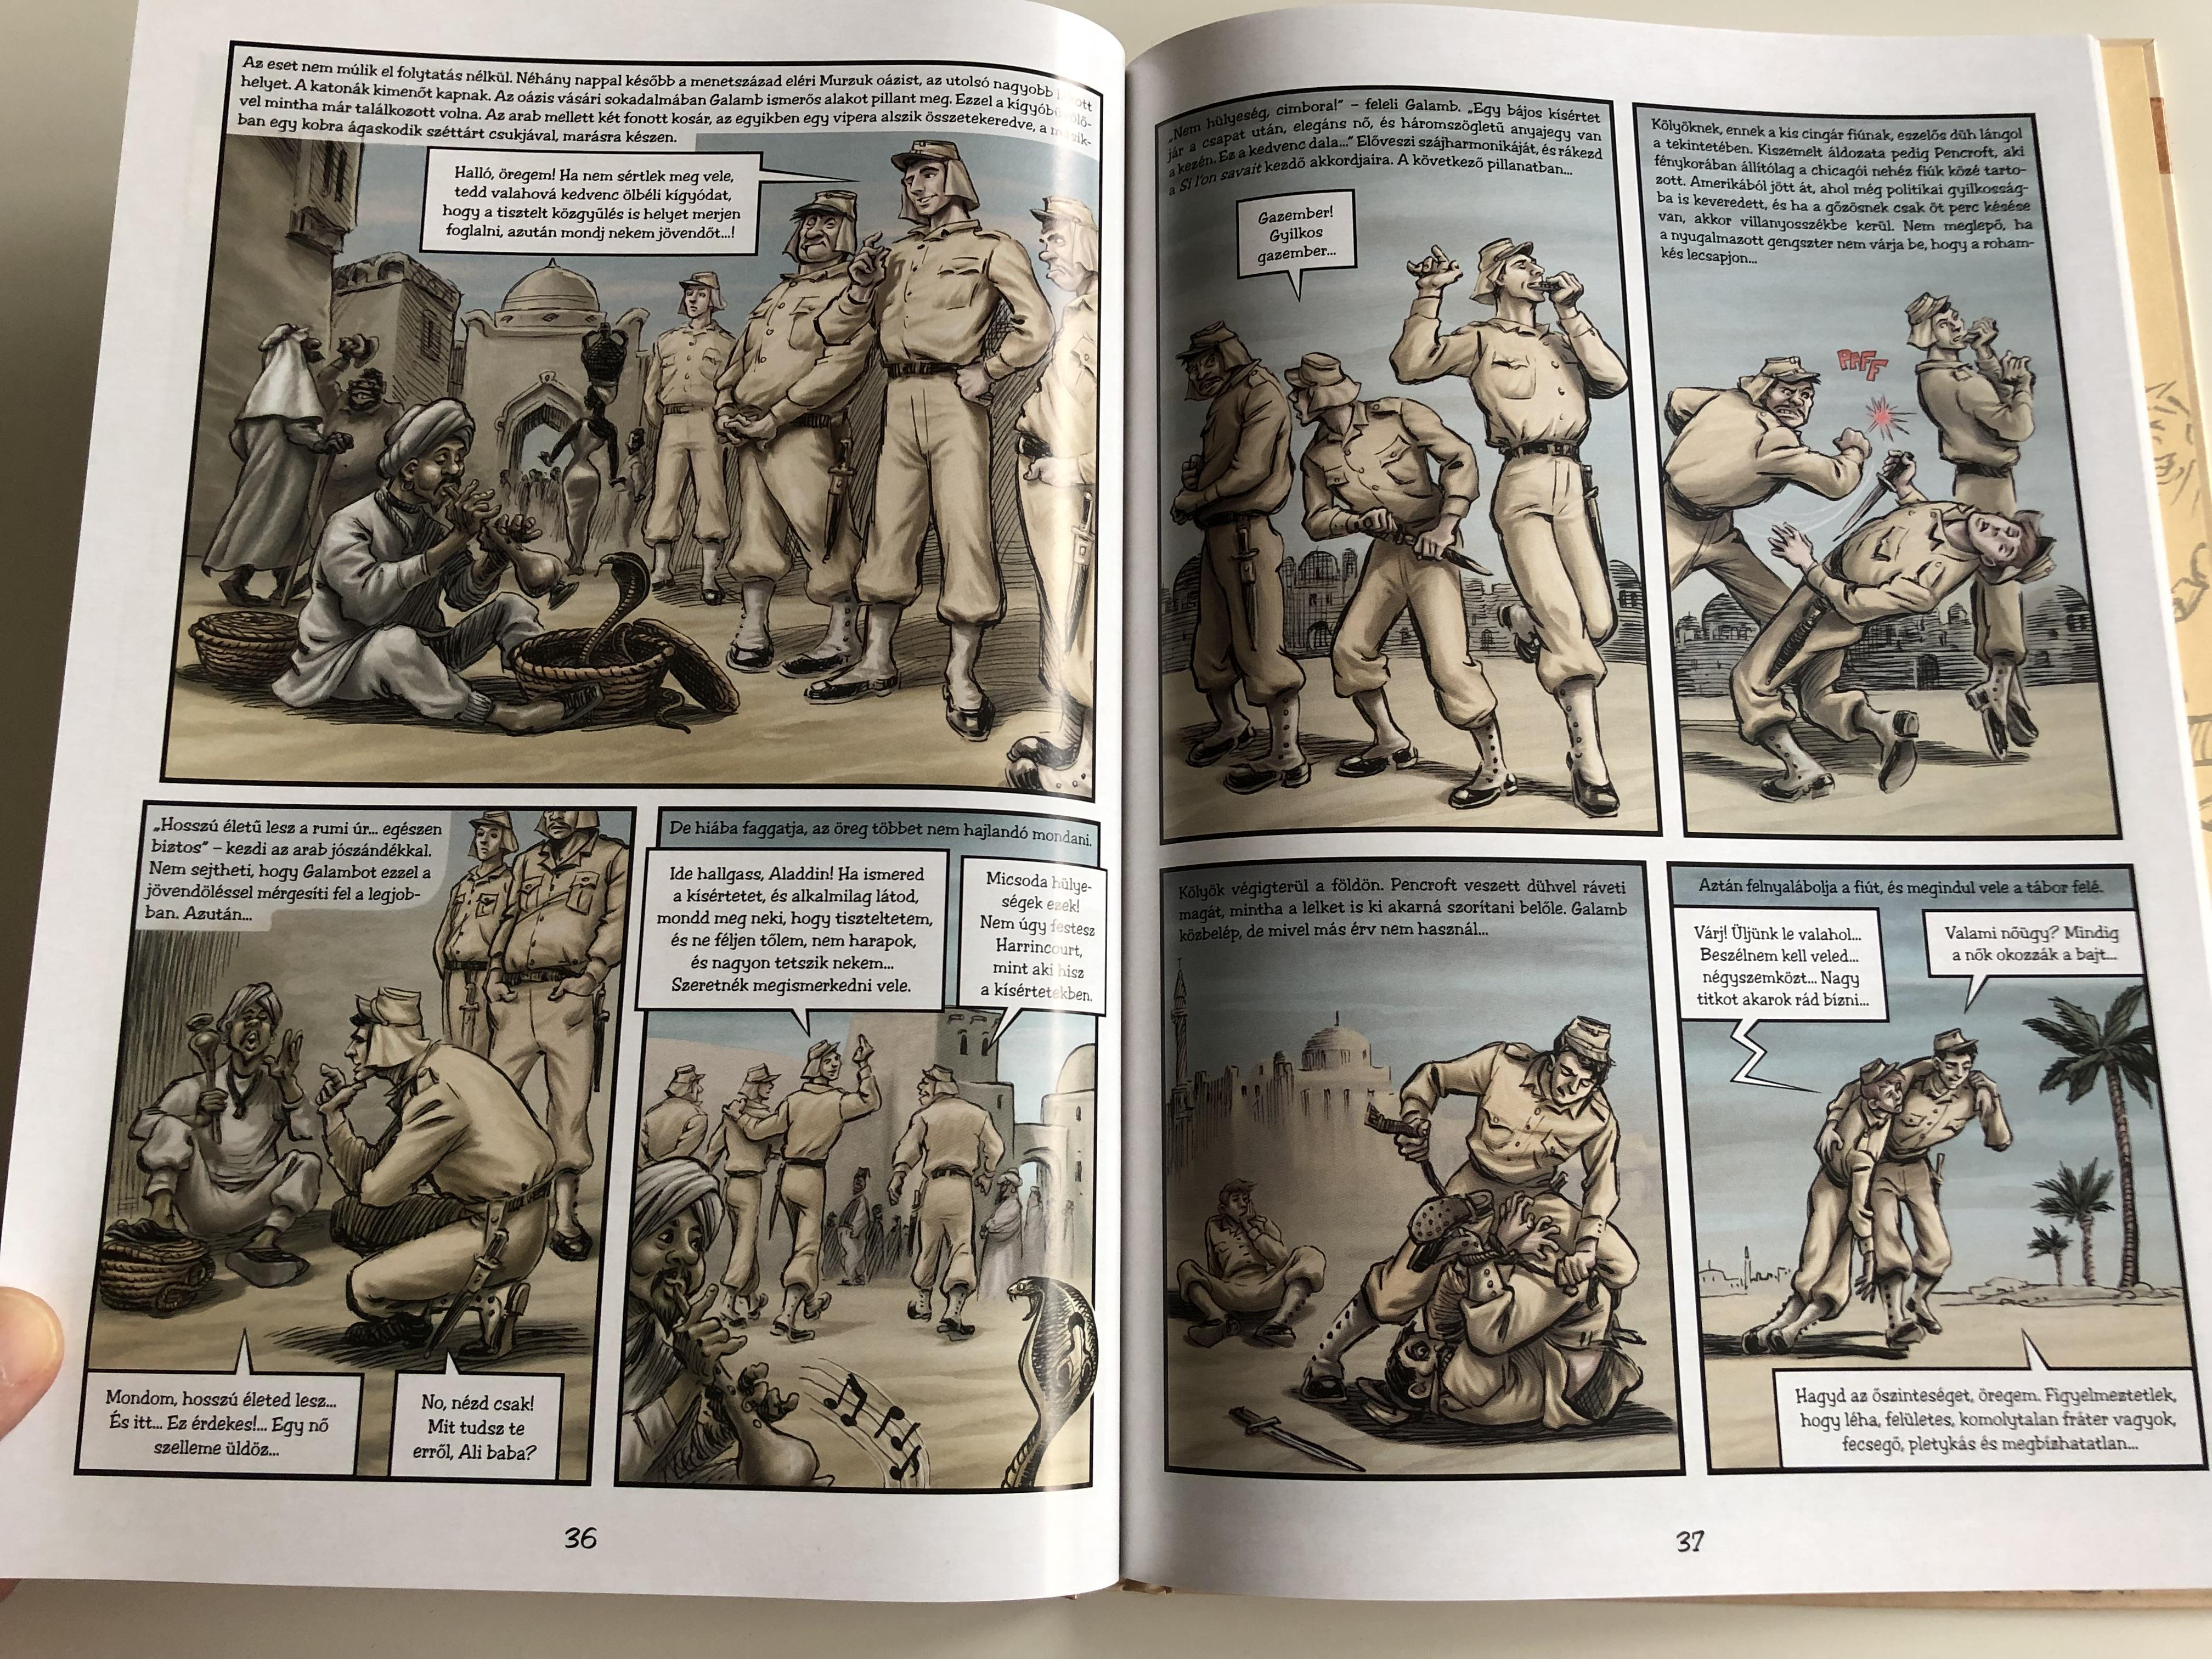 az-el-tretolt-hely-rs-g-by-rejt-jen-korcsm-ros-p-l-sz-nes-k-preg-ny-the-frontier-garrison-color-comic-book-hardcover-2013-3rd-edition-k-pes-kiad-7-.jpg